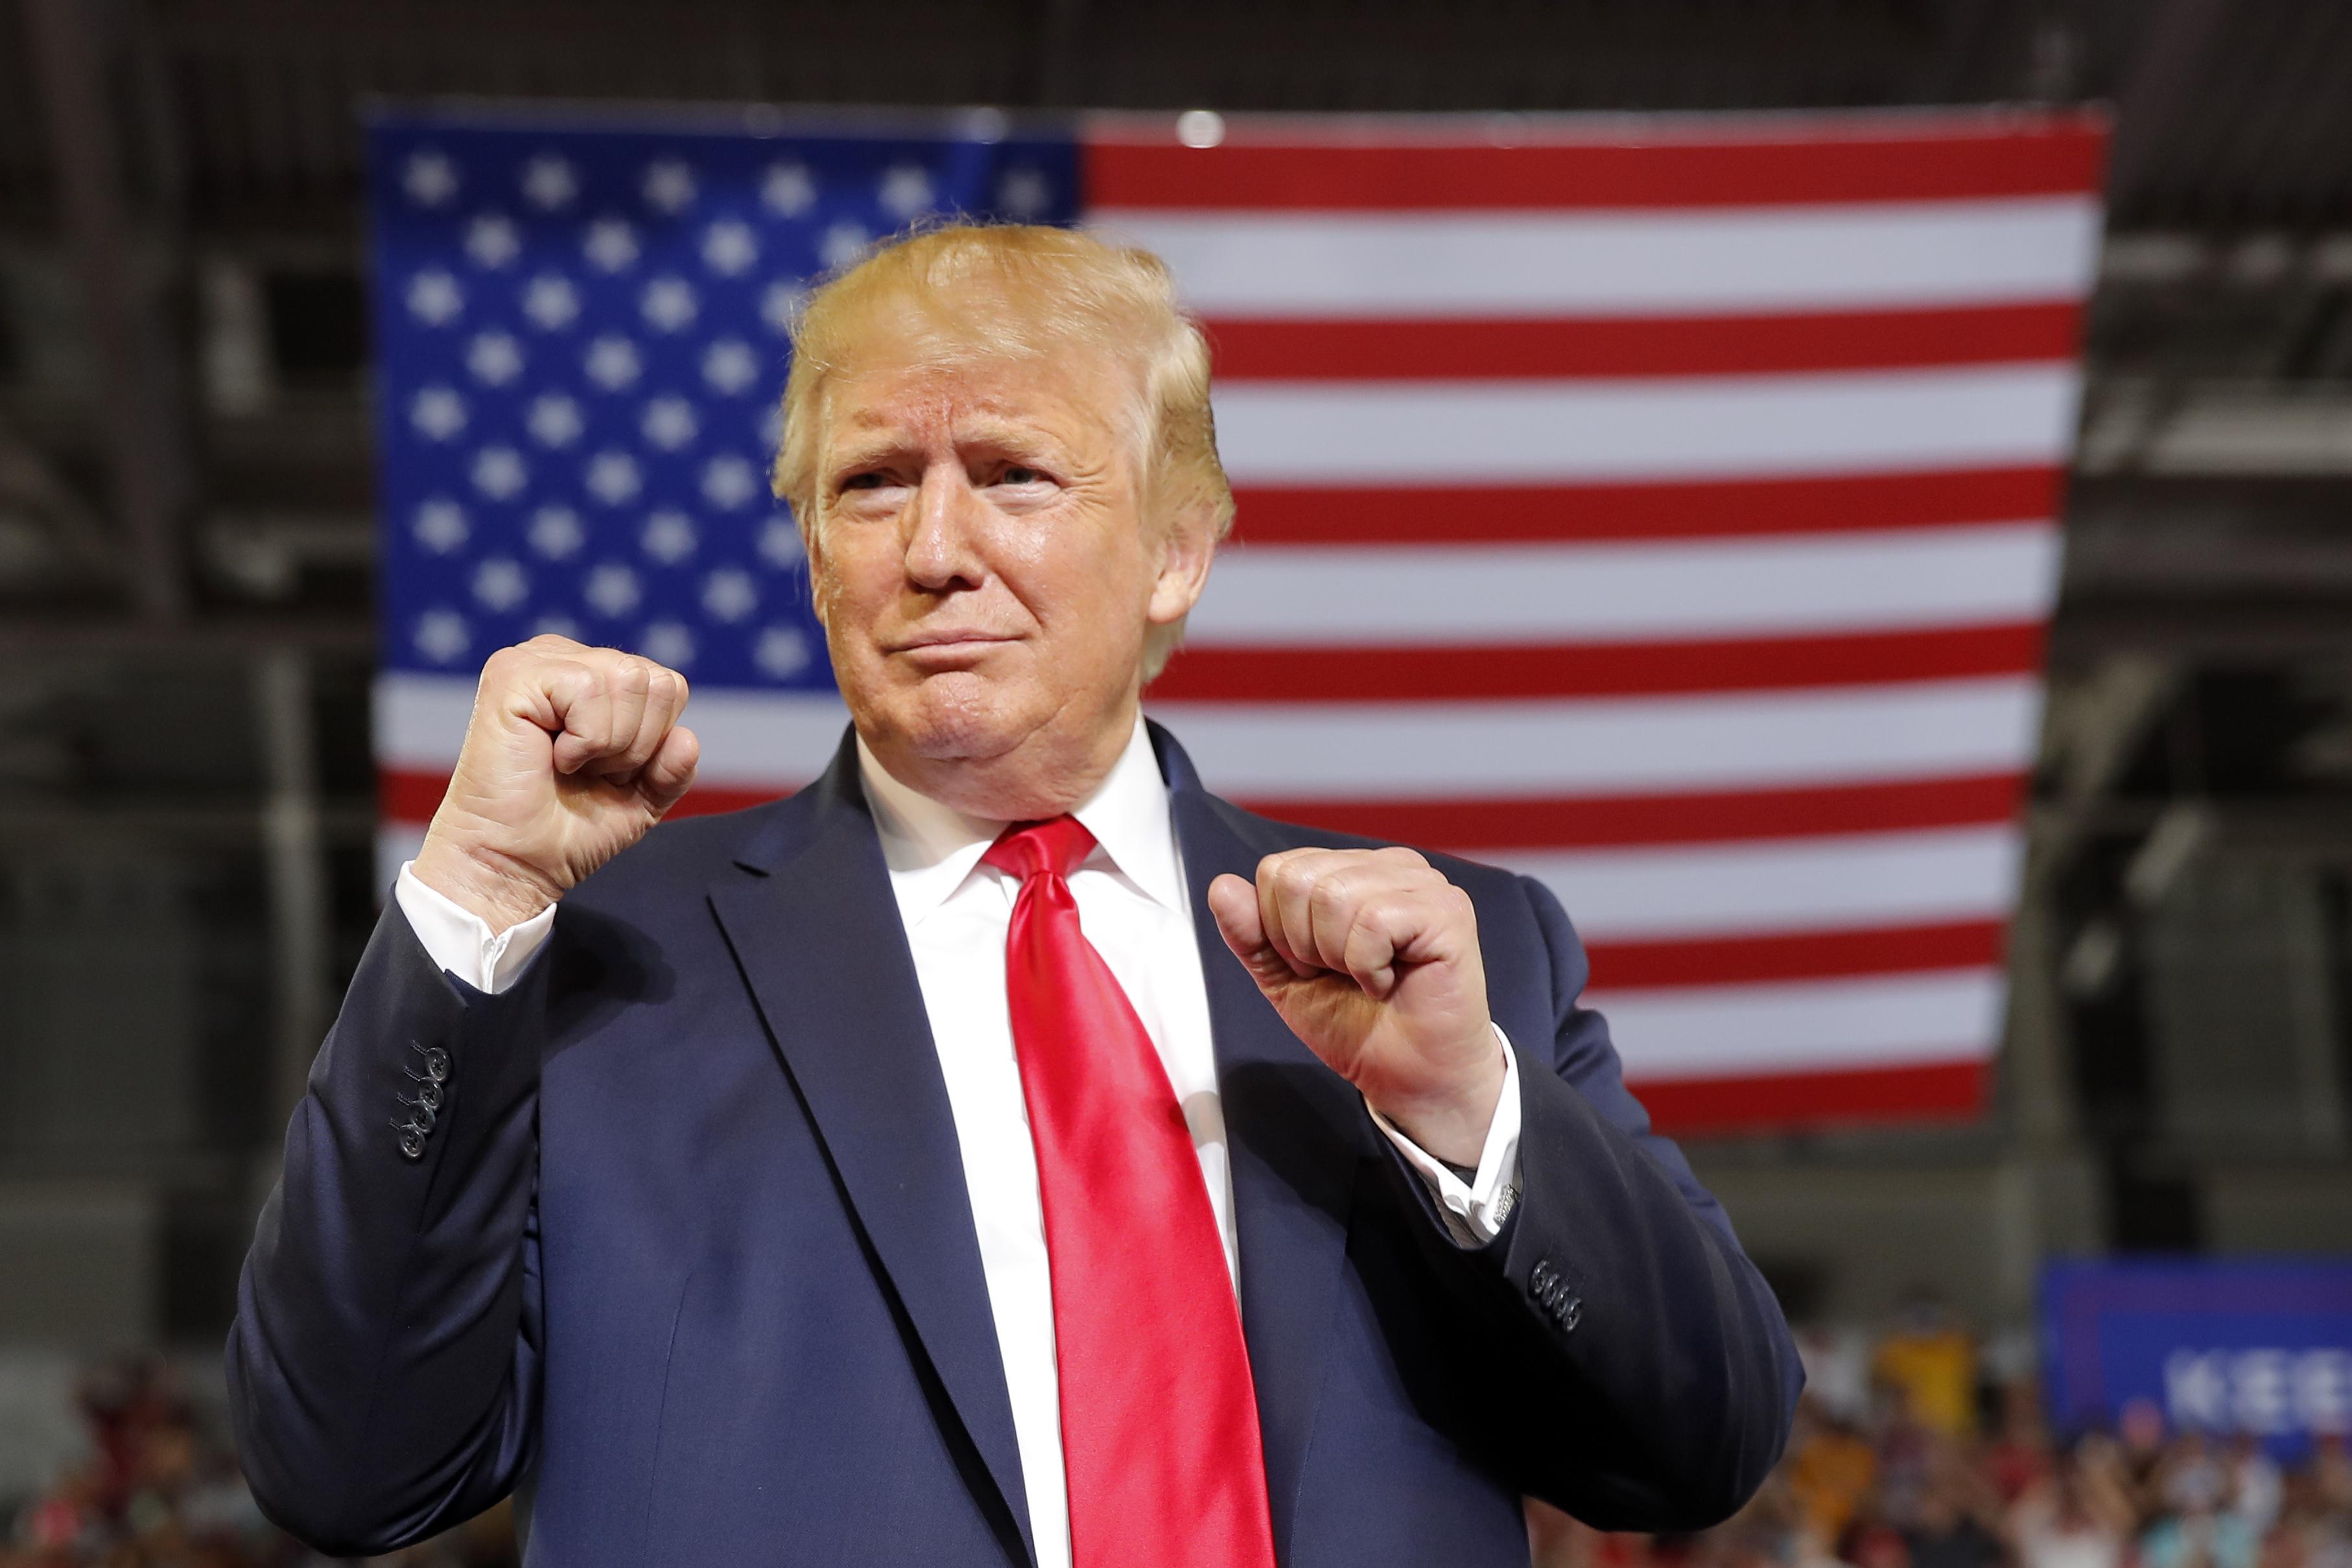 https://www ksn com/news/politics/trump-slams-congresswomen-crowd-roars-send-her-back/